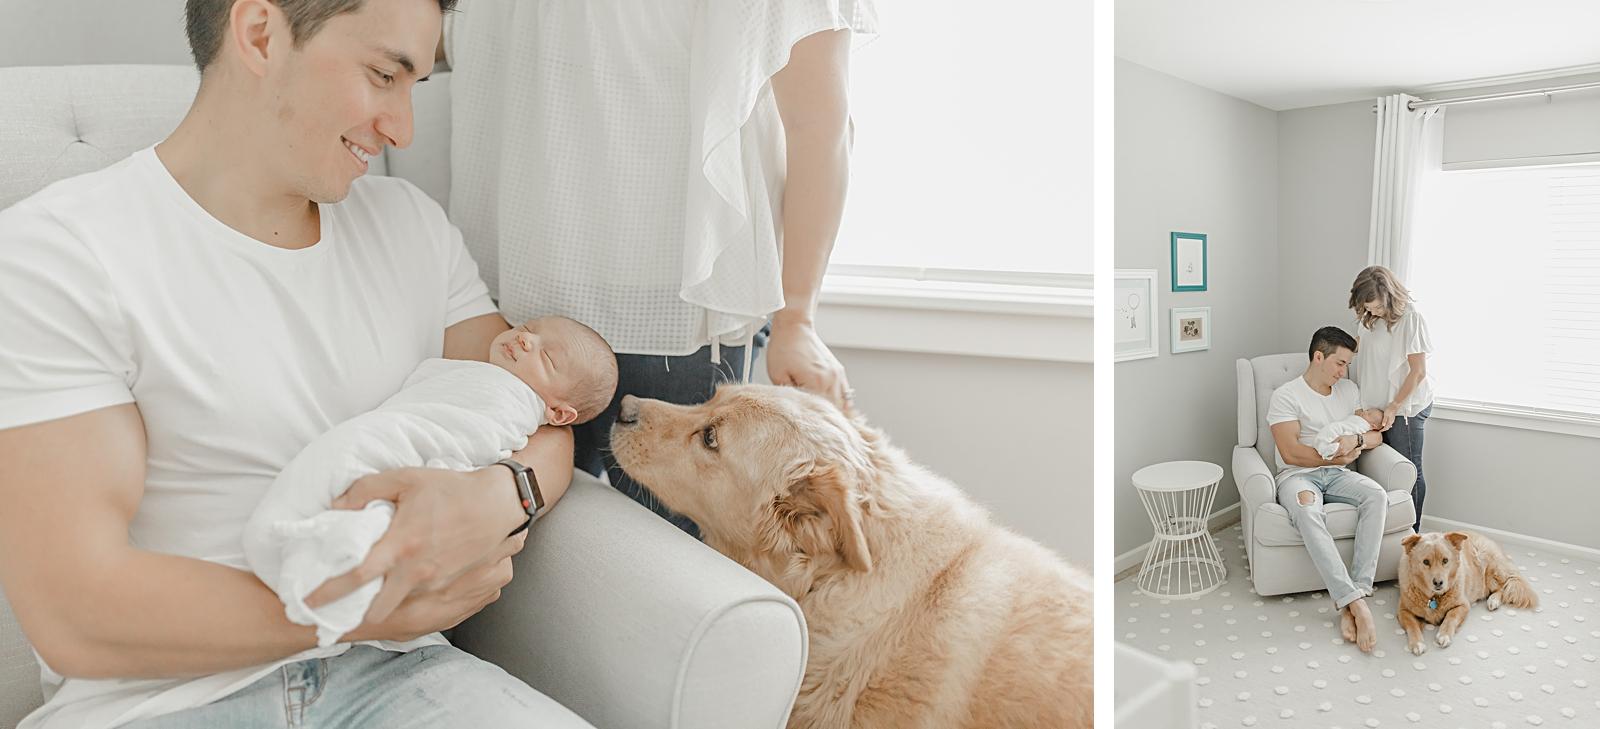 Hanssen Newborn Session | Cassandra Shiree Photography